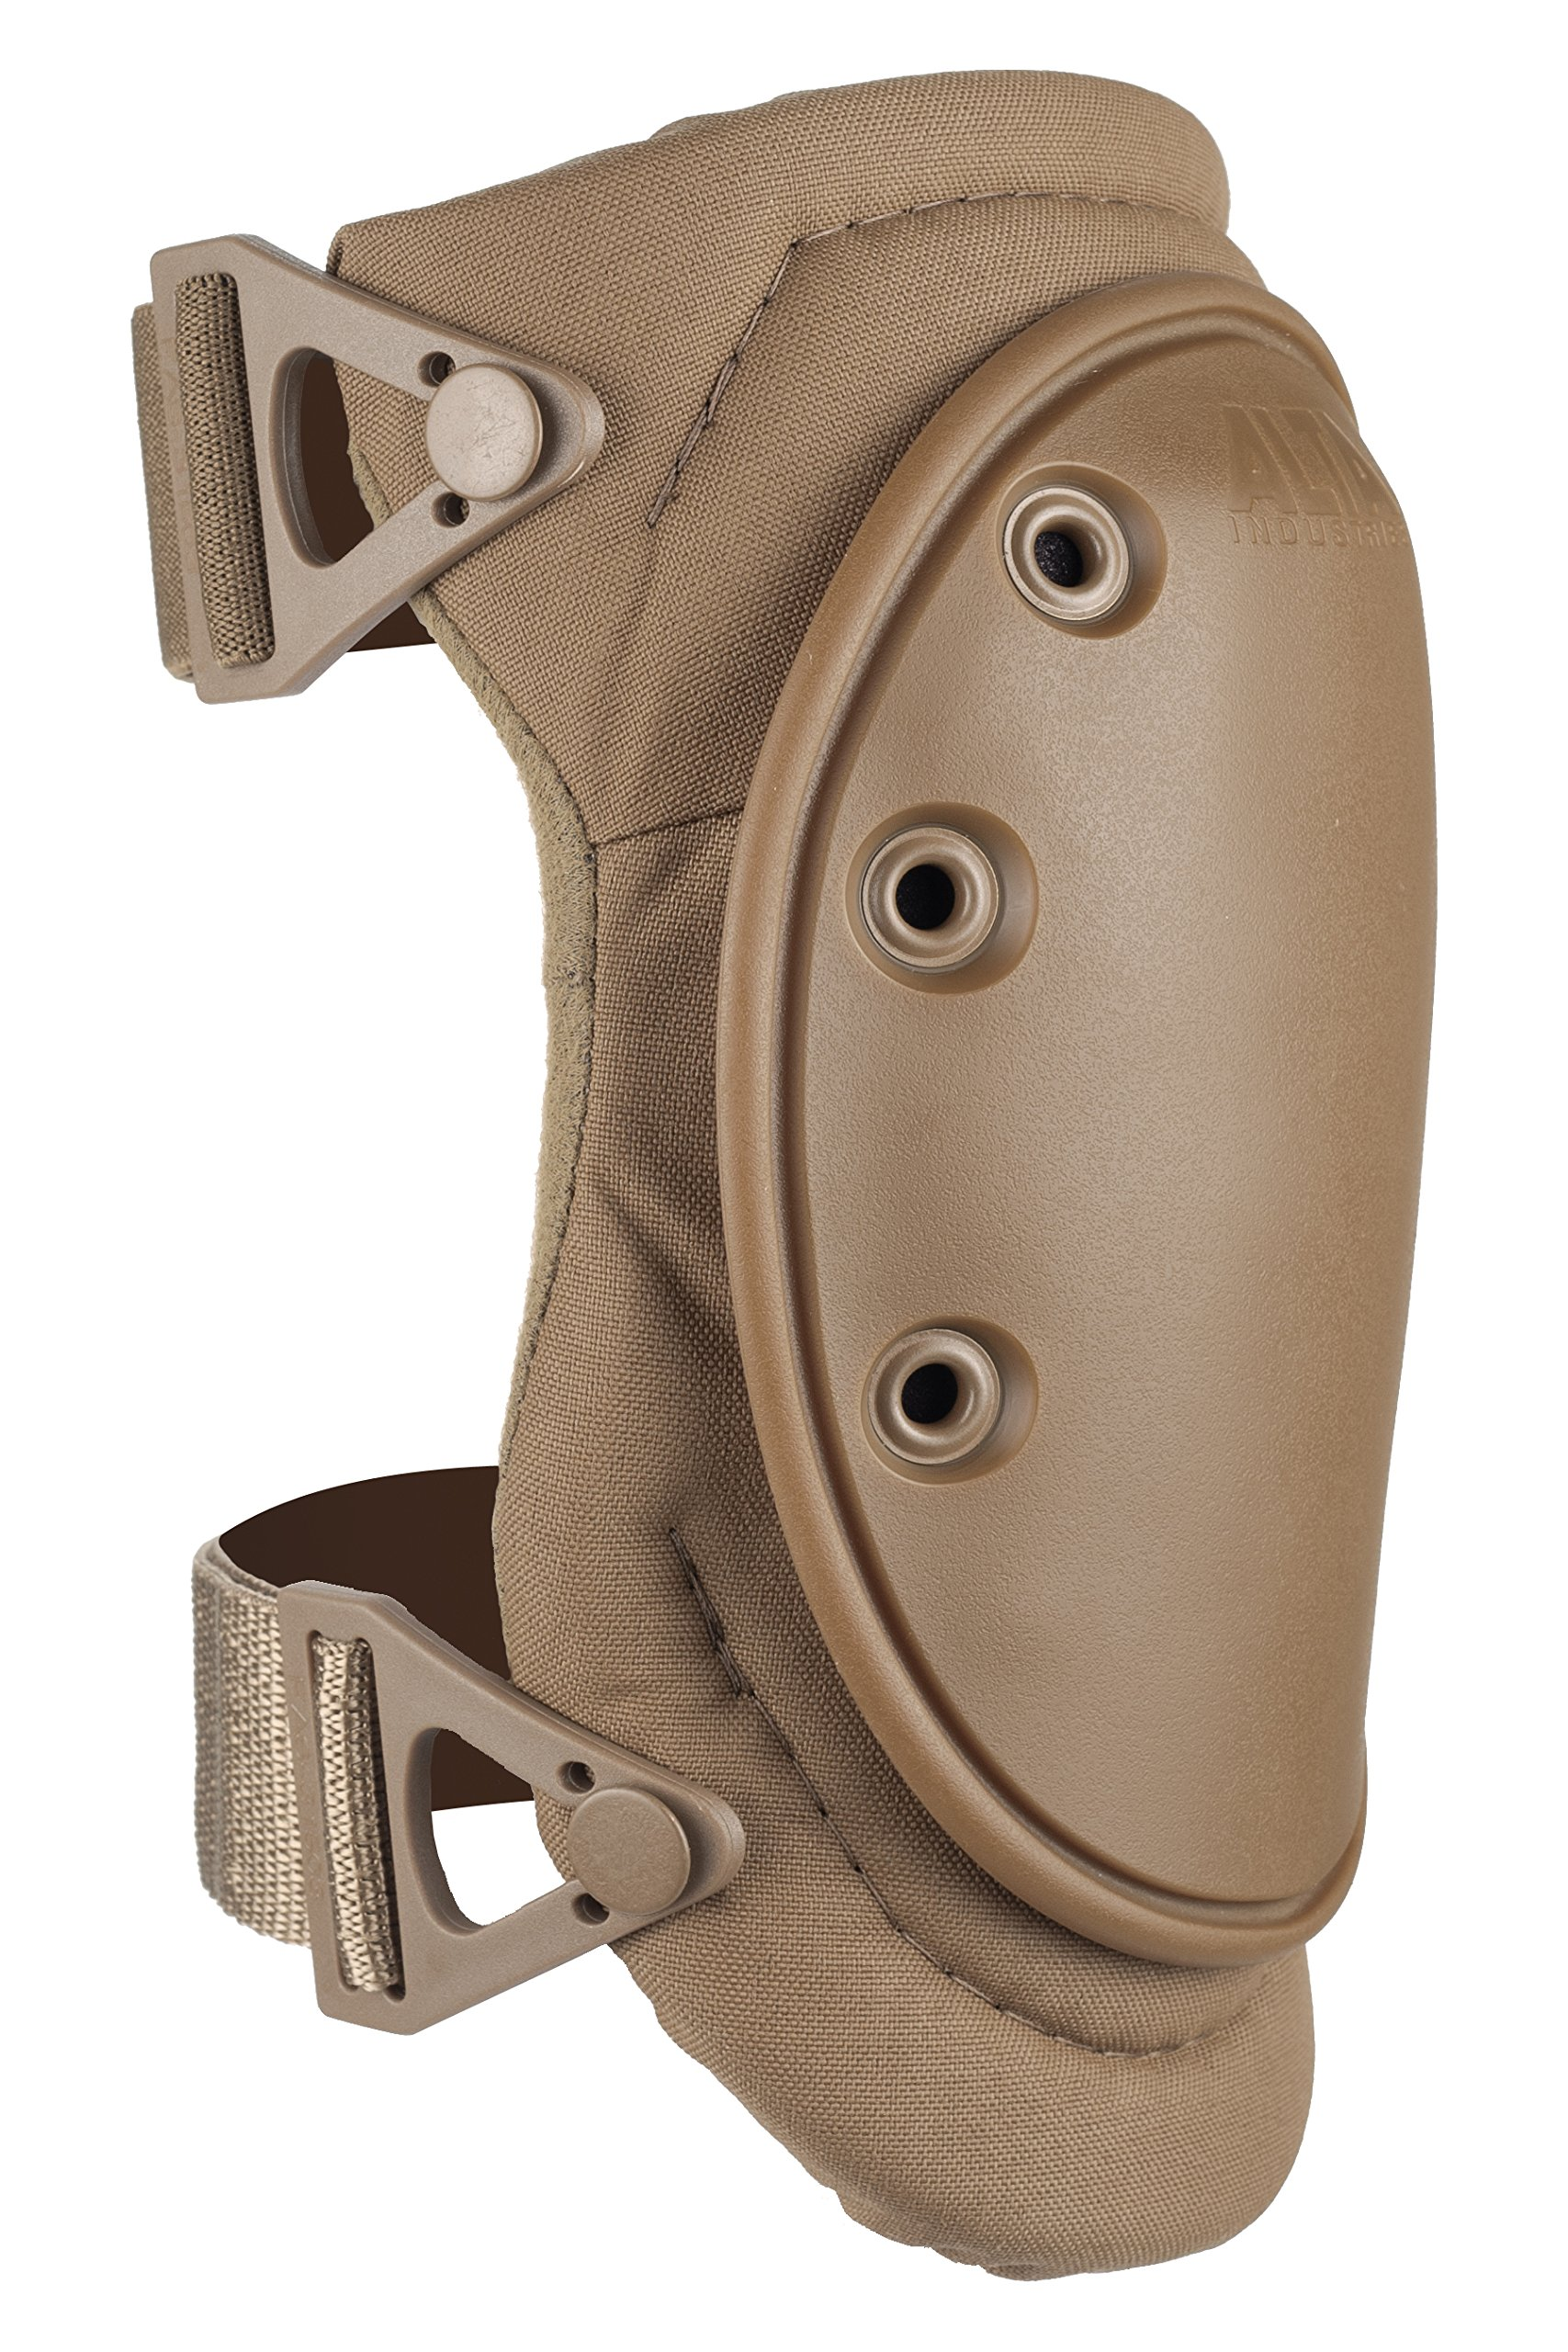 ALTA 50453.14 AltaFLEX Gel Insert Heavy Duty Knee Protector Pad, Coyote Cordura Nylon Fabric, AltaLOK Fastening, Flexible Cap, Long, Coyote